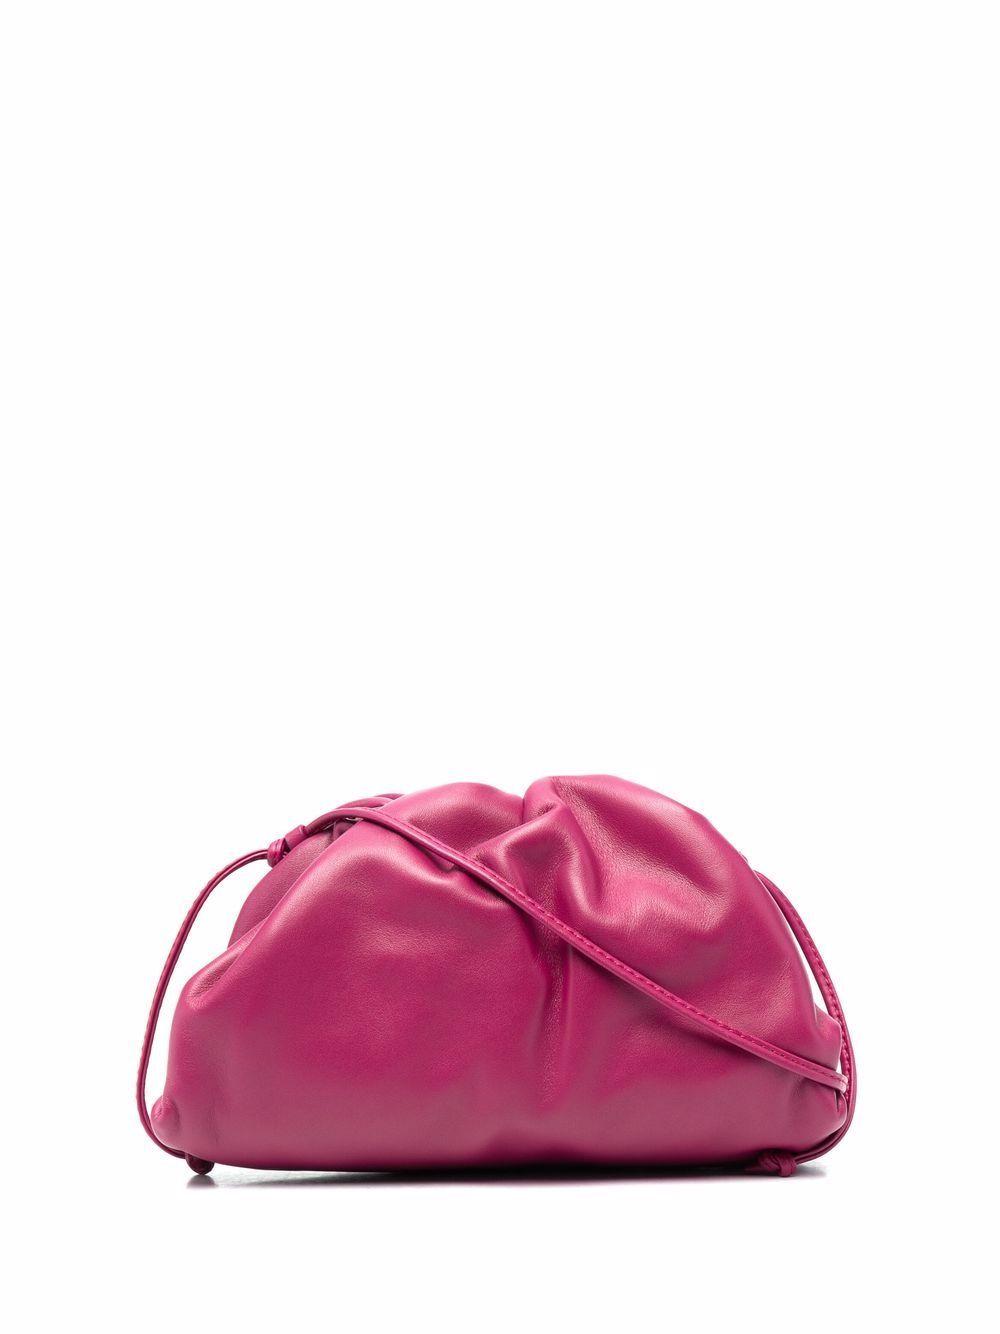 Borsa the pouch mini in pelle - Bottega Veneta